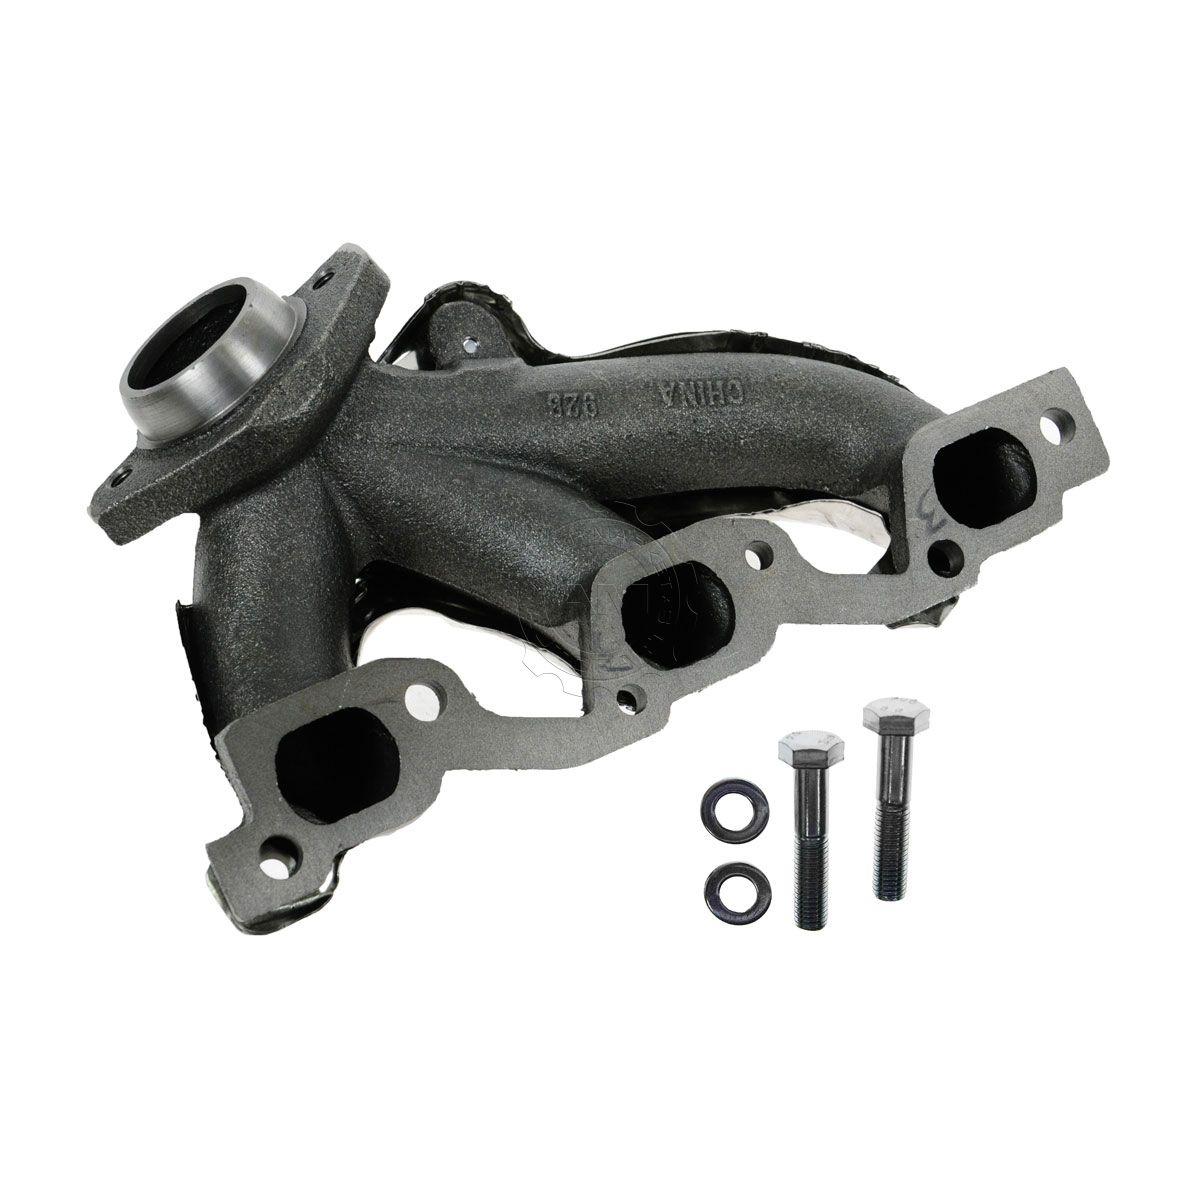 Dorman 674-914 Exhaust Manifold Kit